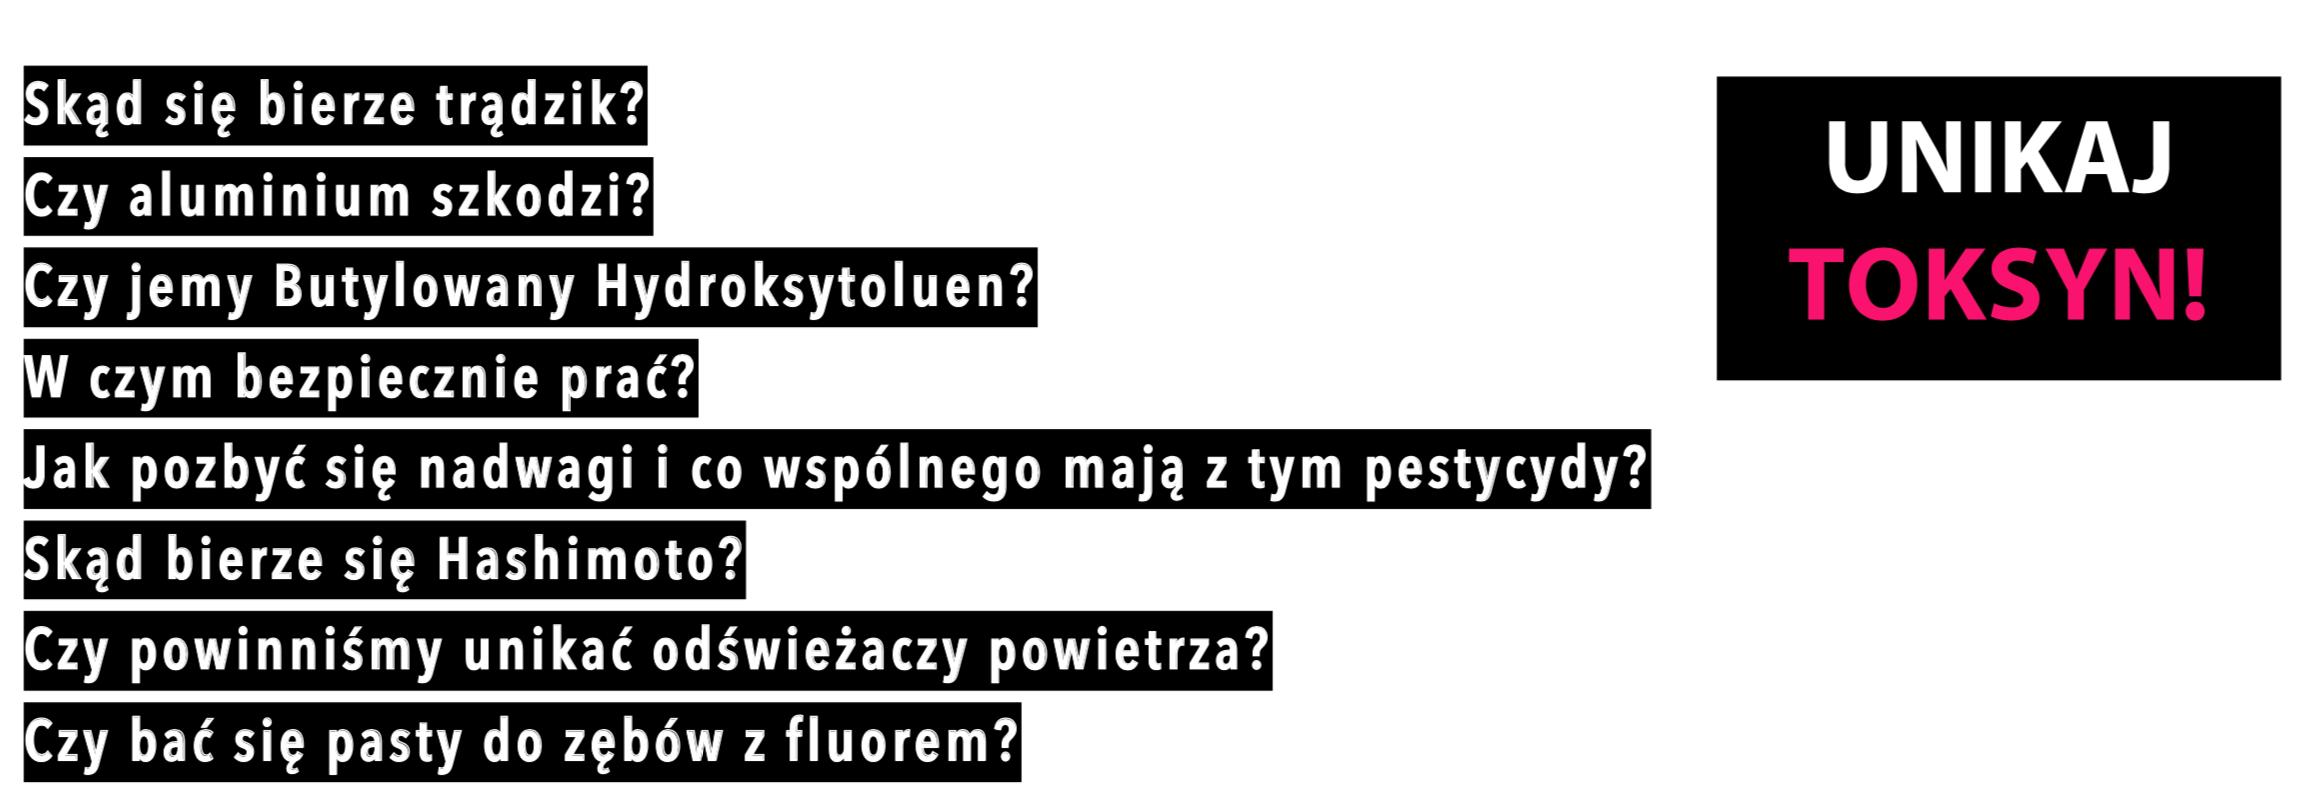 hipoalergiczni-trzecie-forum-alergii-targi-natura-food-2018-tematy